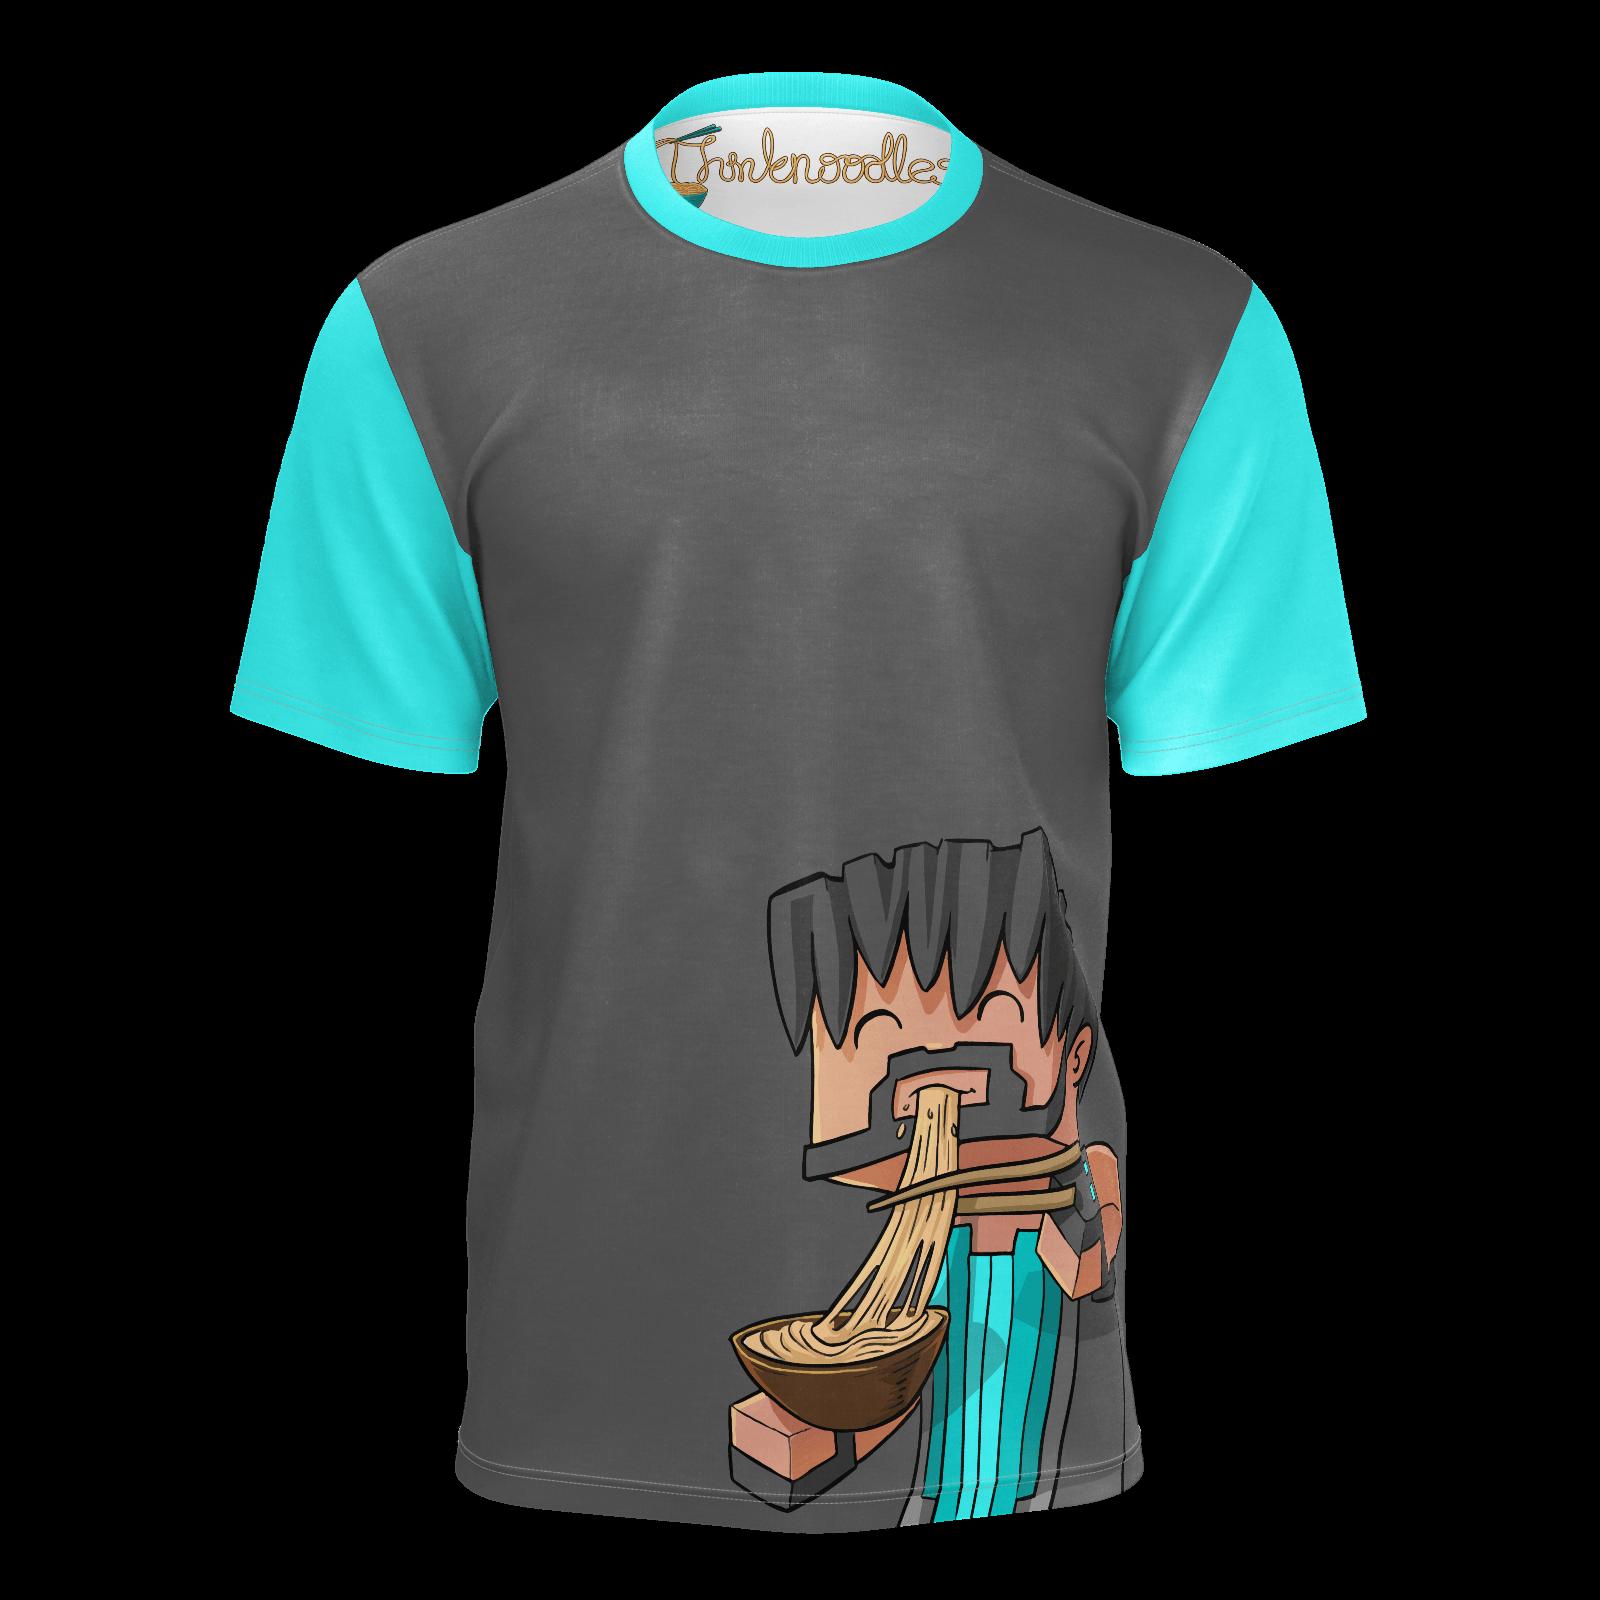 Hoodie clipart kid sweatshirt. Thinknoodles studio rad tshirt